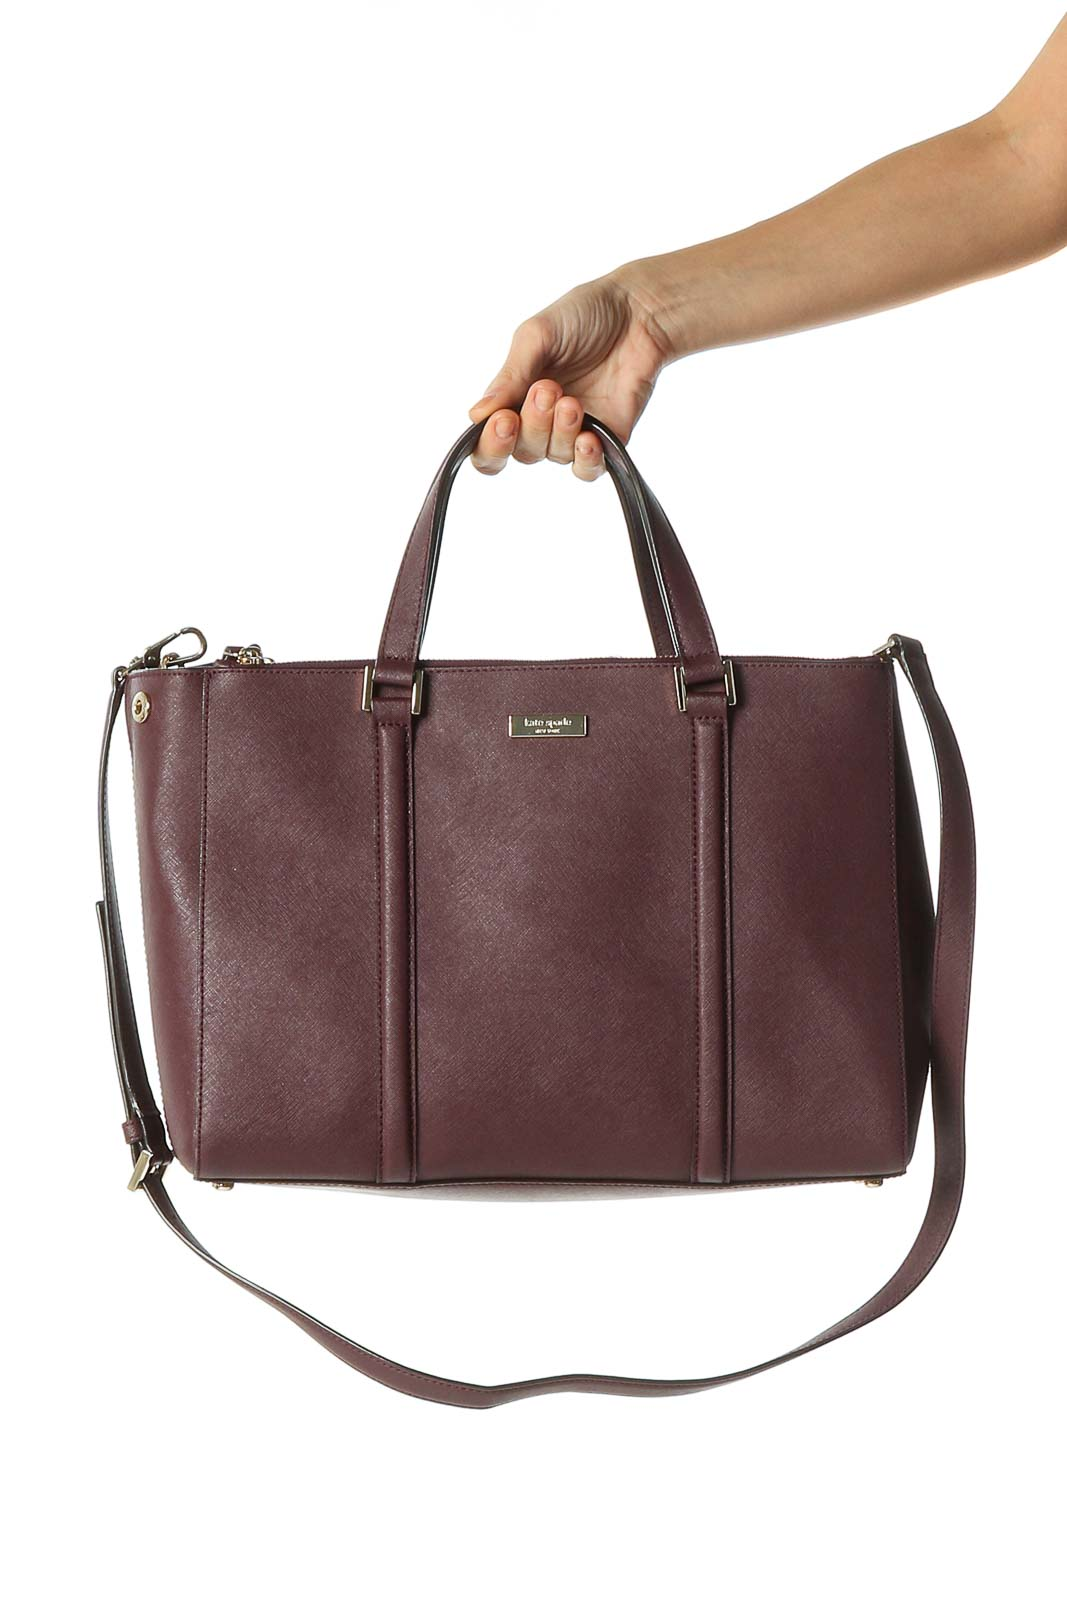 Brown Duffle Bag Front